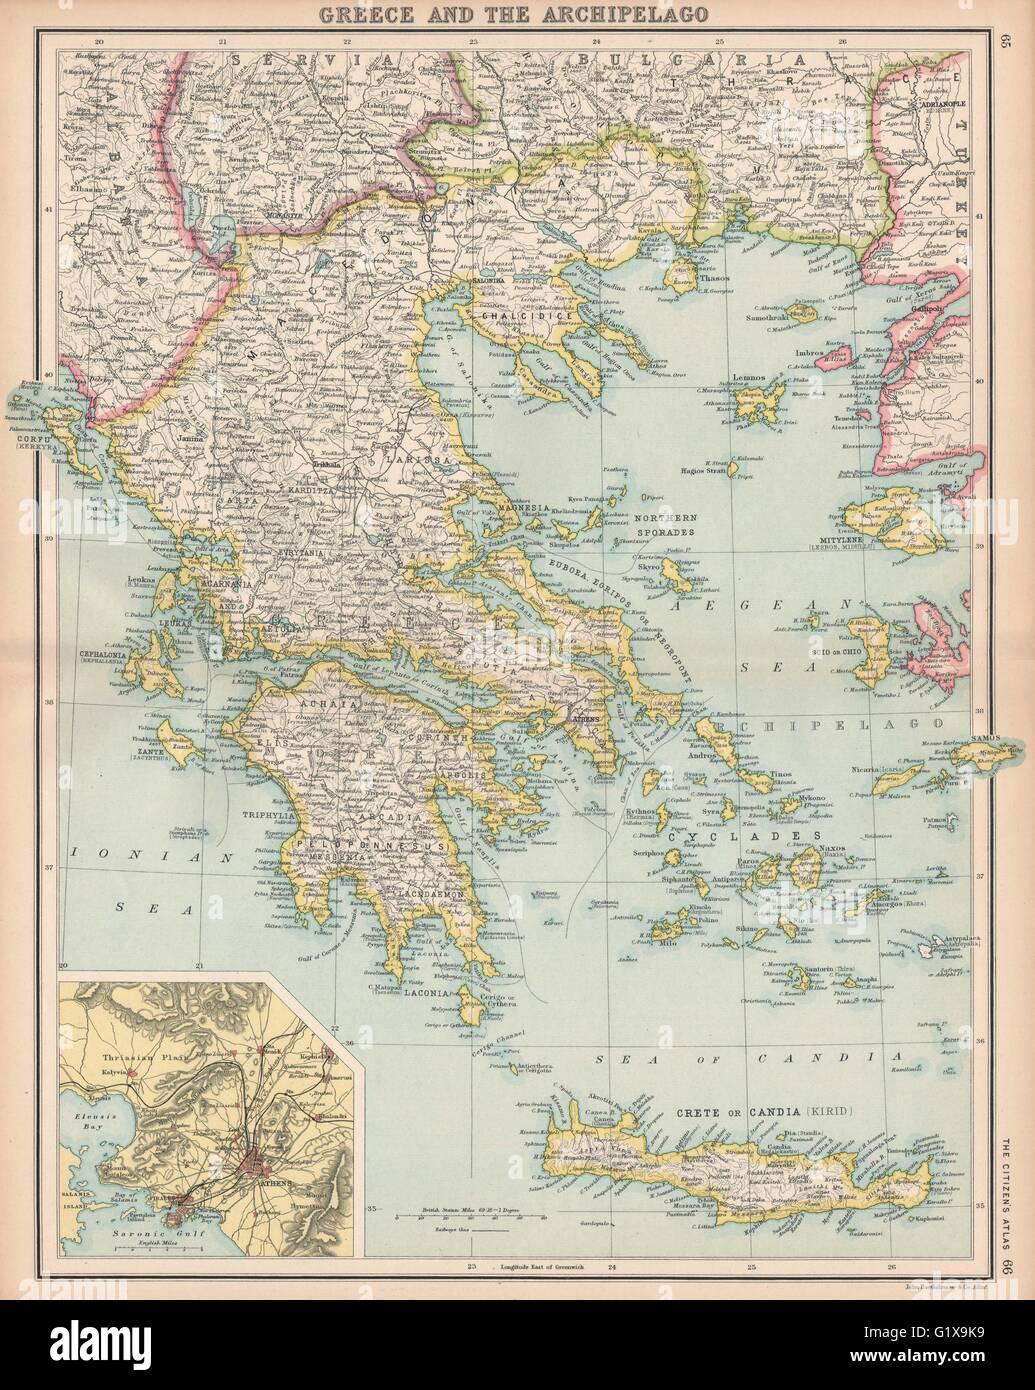 Greece aegean ionian islands crete inset athens bartholomew greece aegean ionian islands crete inset athens bartholomew 1912 old map gumiabroncs Images